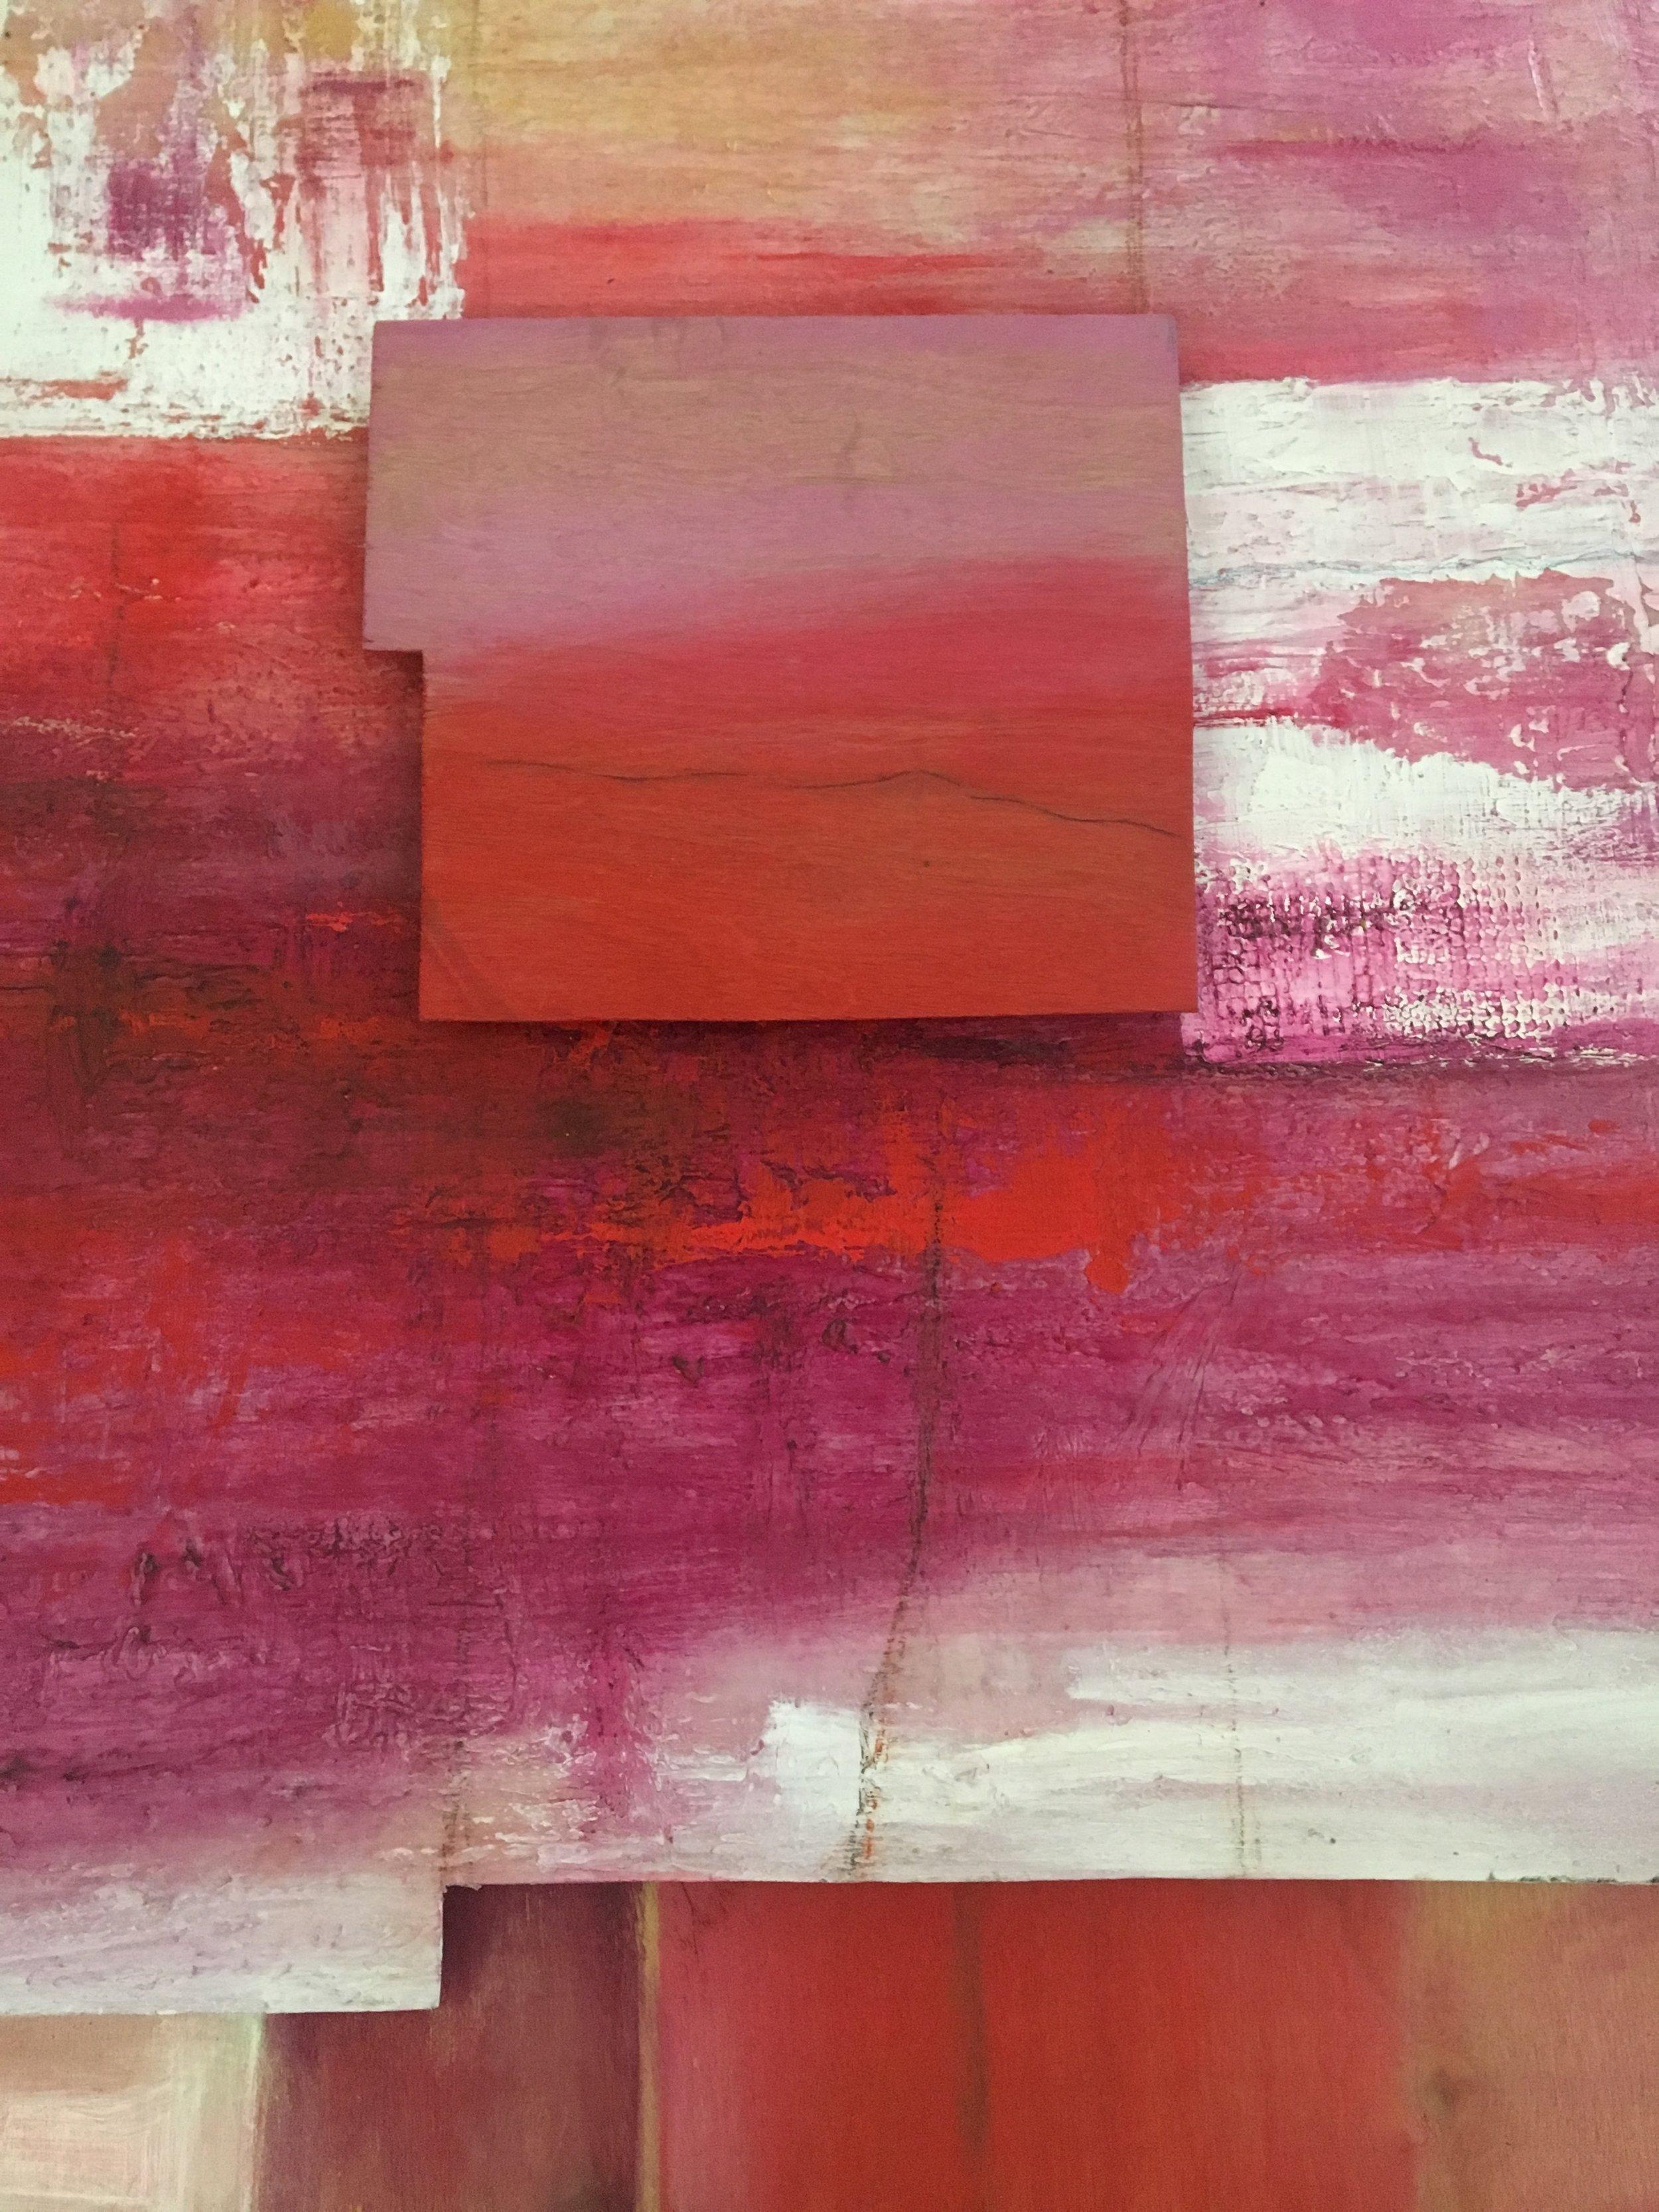 Carmen Teal, Leonors Portrait, Acrylic on Wood 45x45, 2014